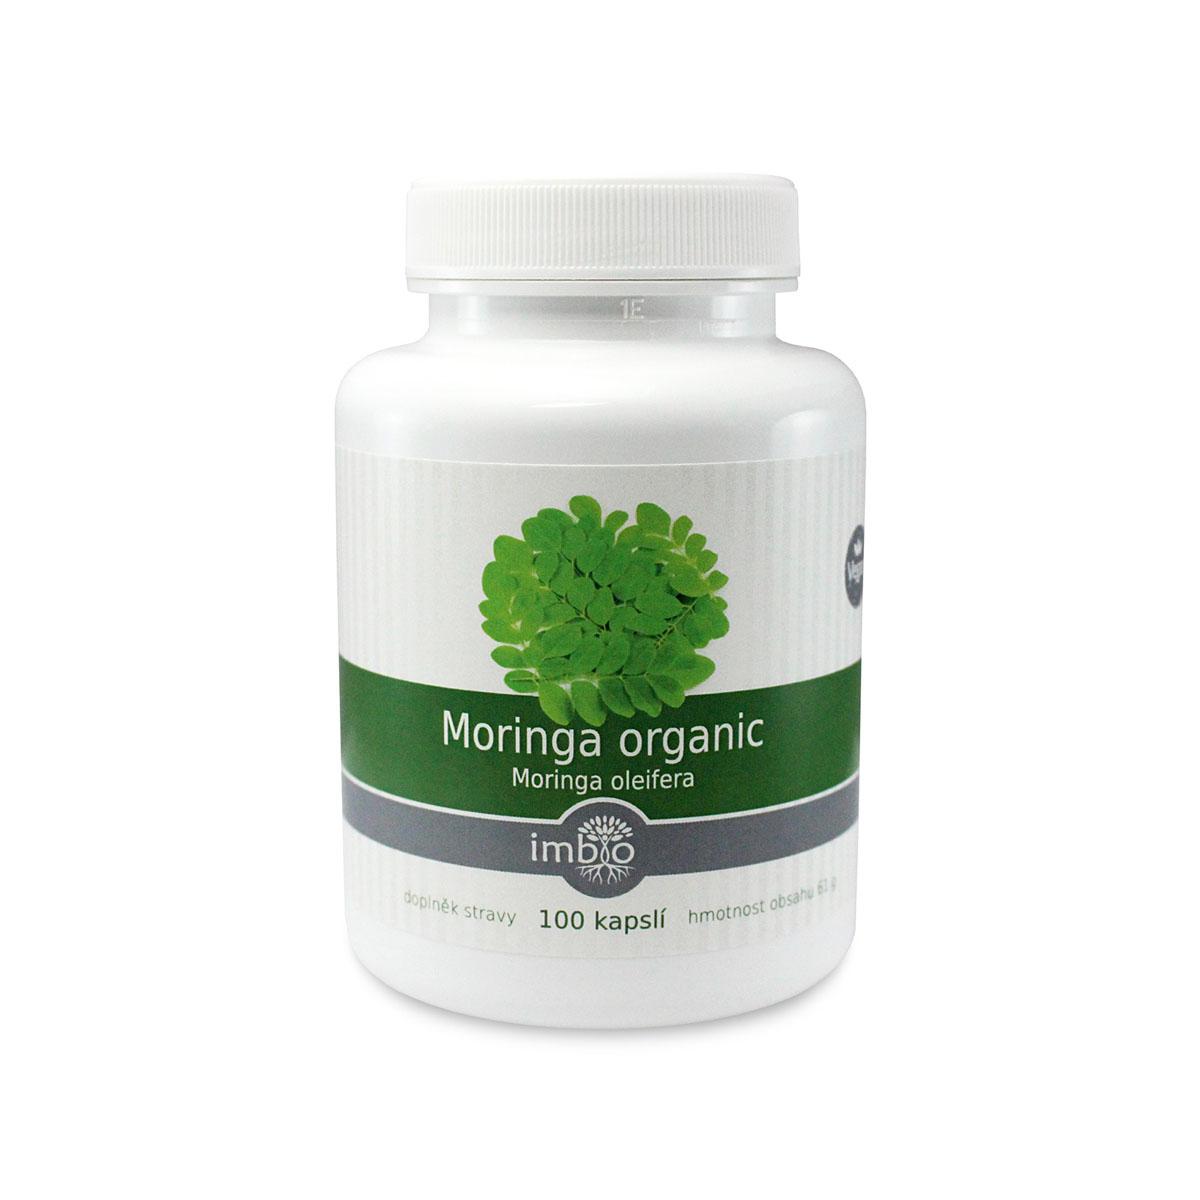 imbio Moringa organic 100 cps